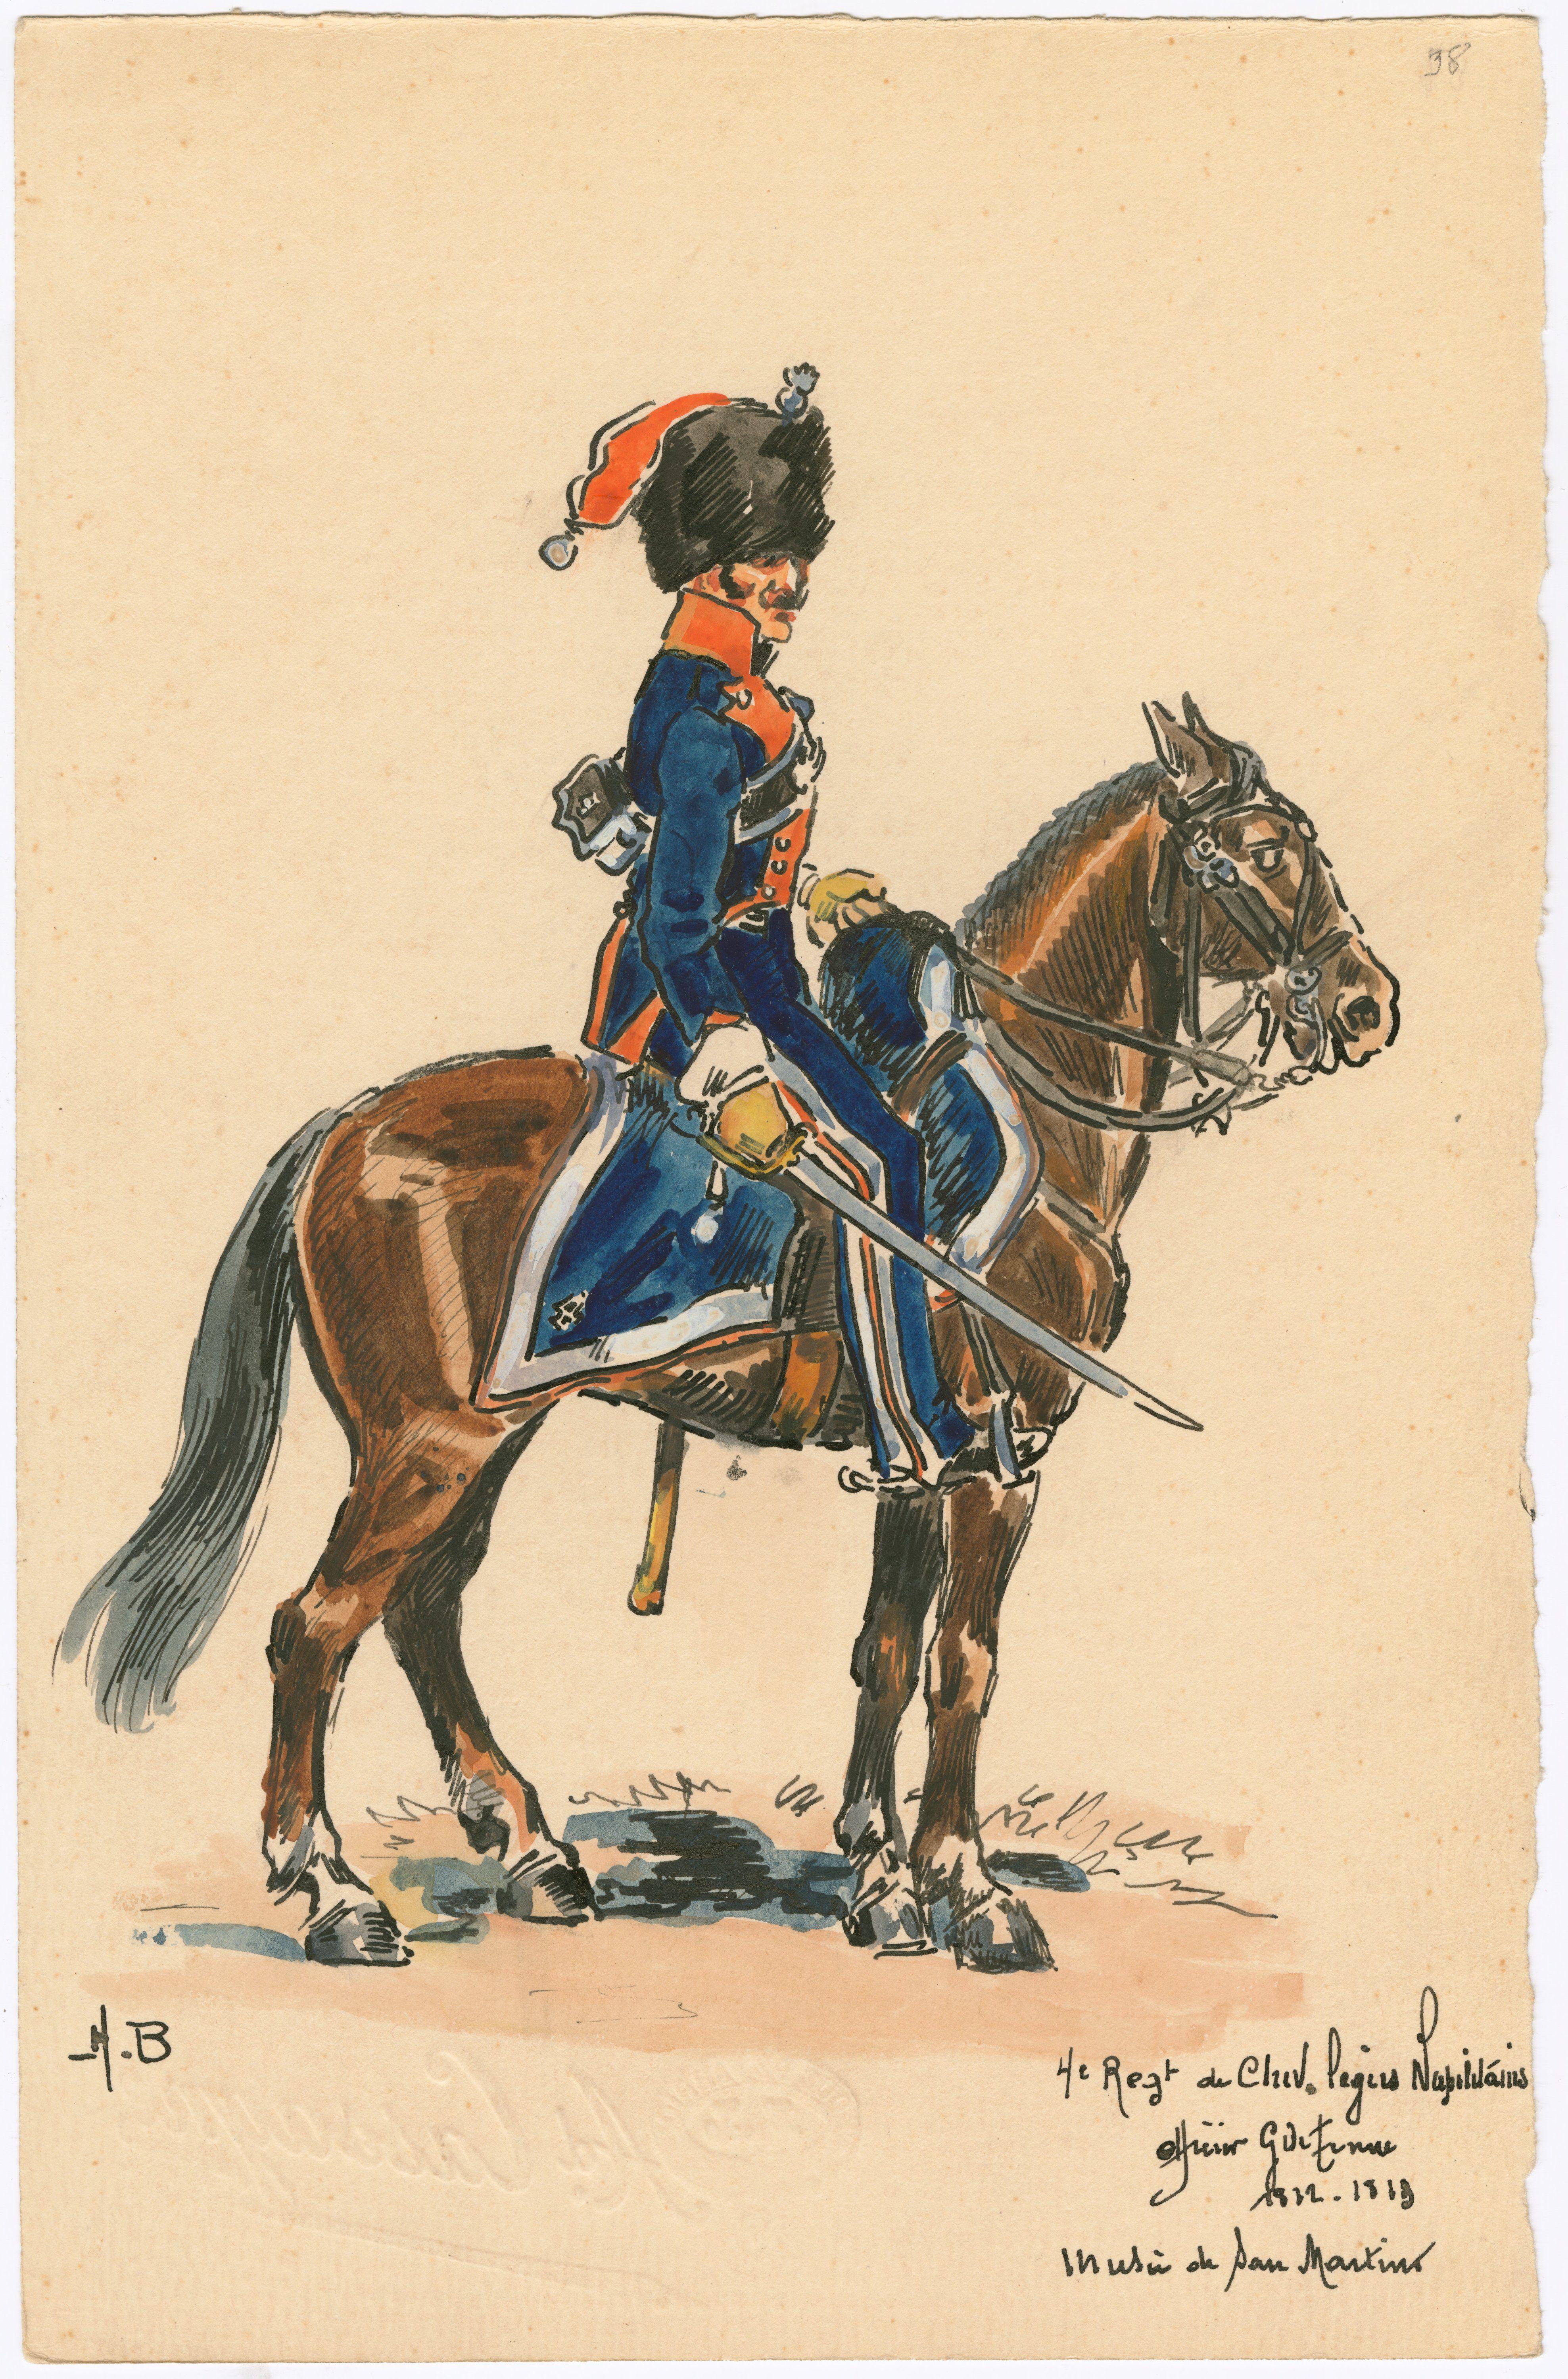 Kingdom of Naples; 4th Regt, Cheveau Legers, Officer, Grande Tenue, 1812-13